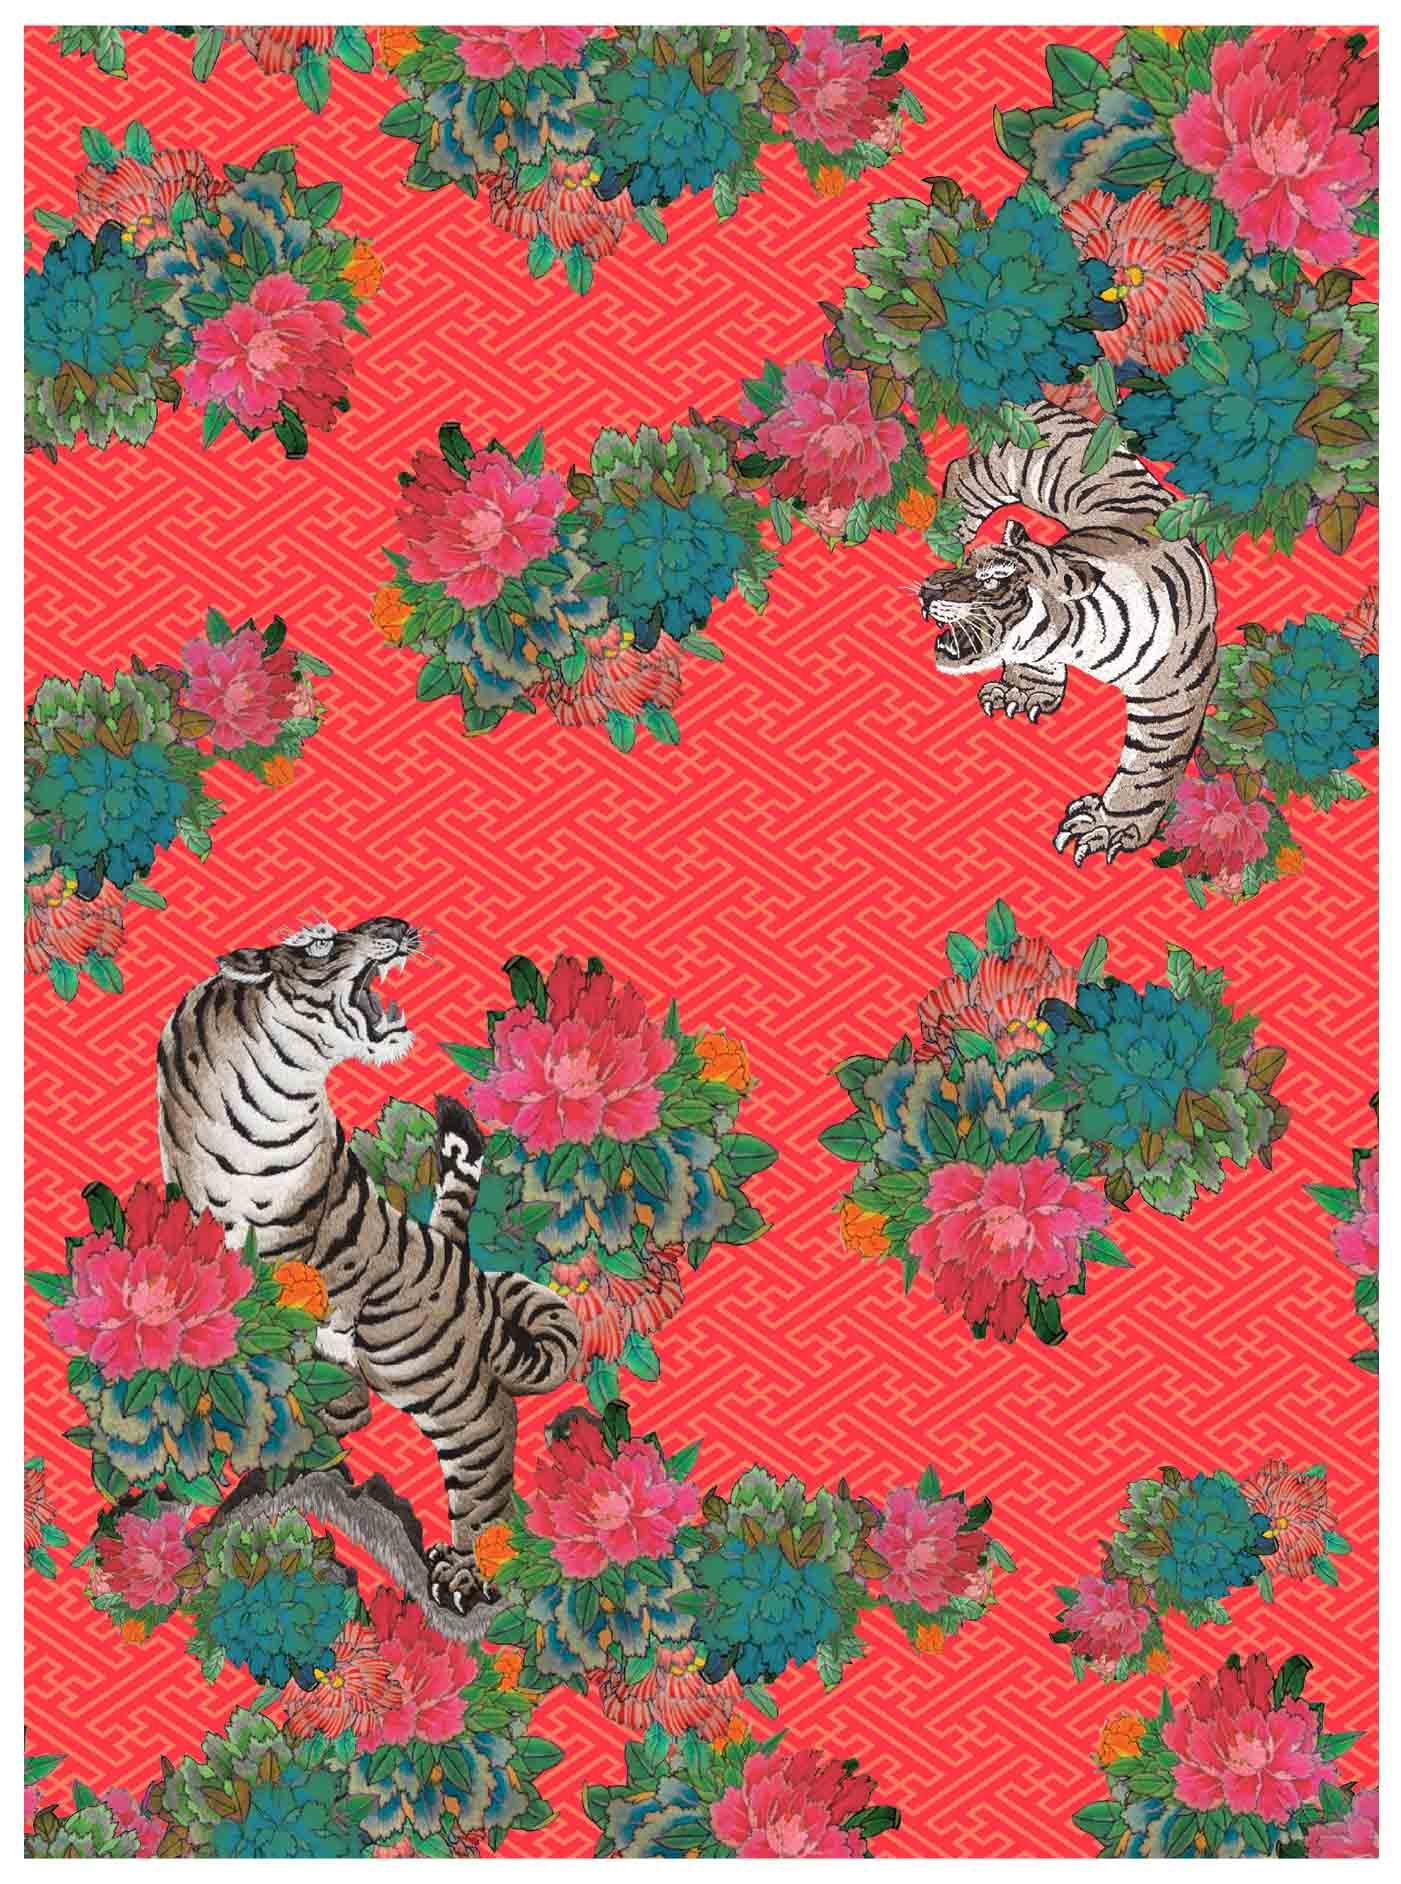 Botan Jungle Print - Horiyoshi The Third X Bella Gomez